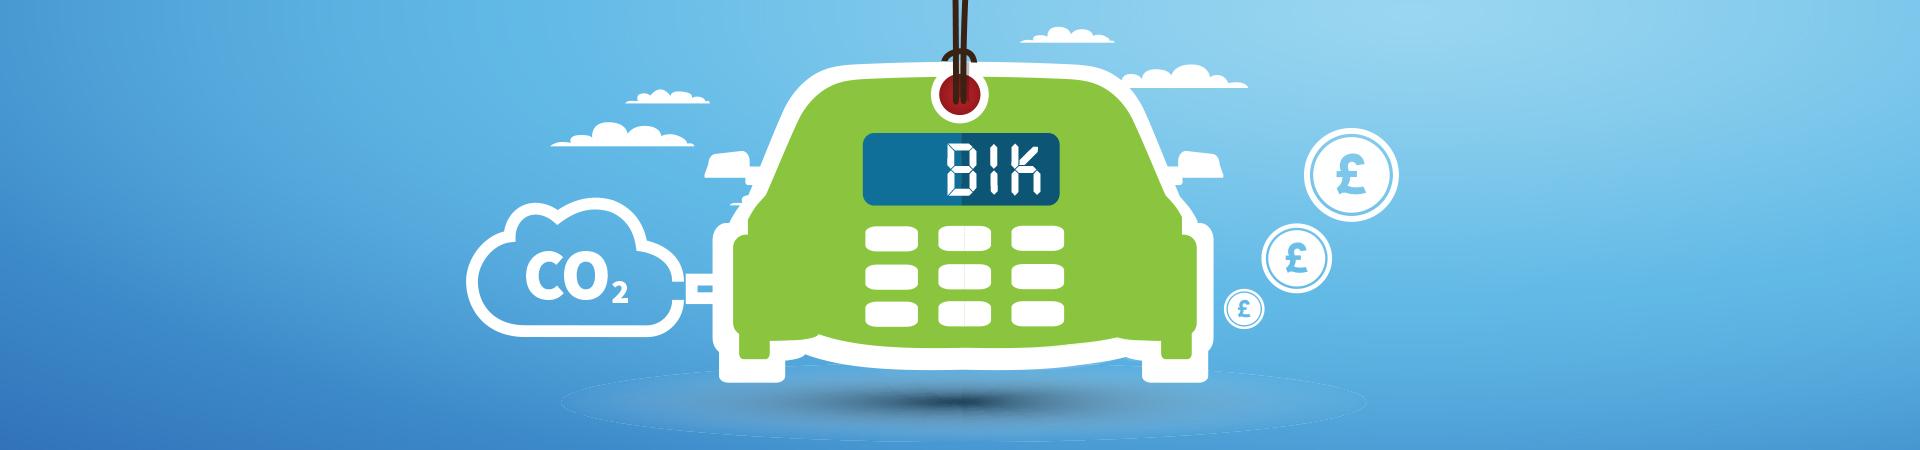 BIK-Tax-Calc